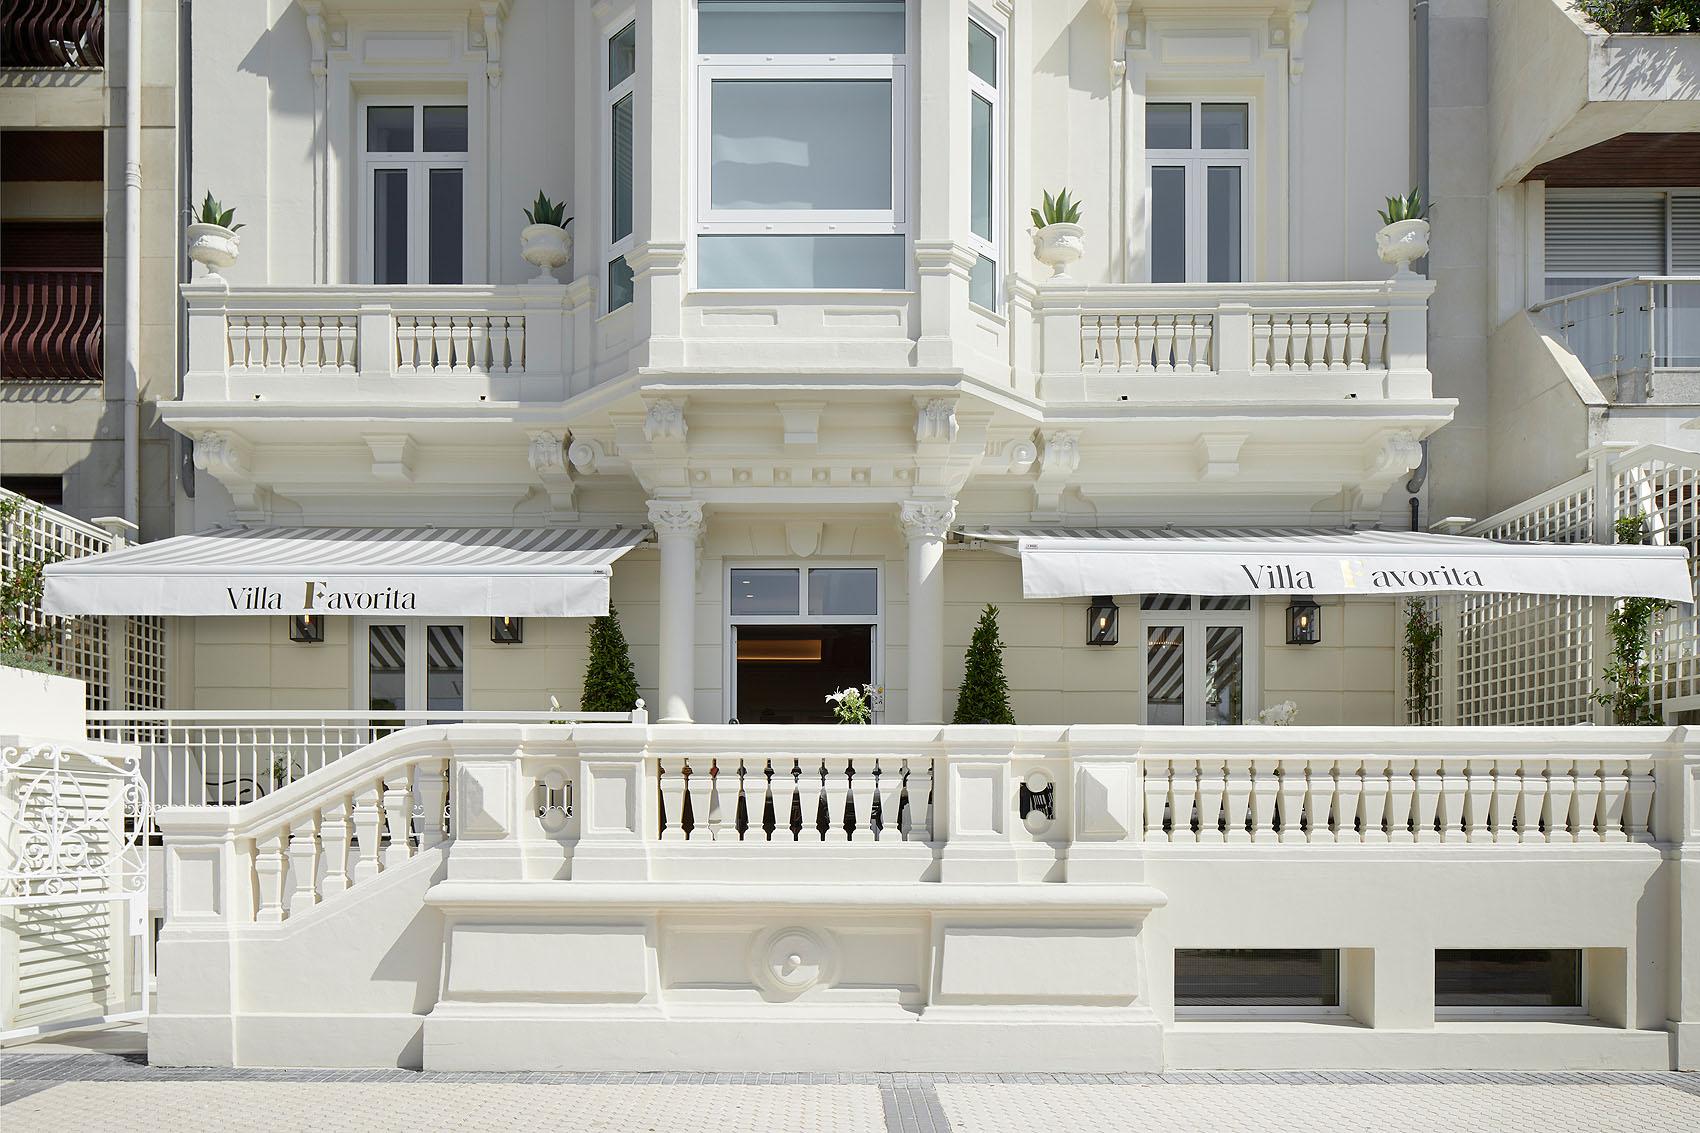 Villa Favorita Bar - Iñaki Caperochipi - Fotografía